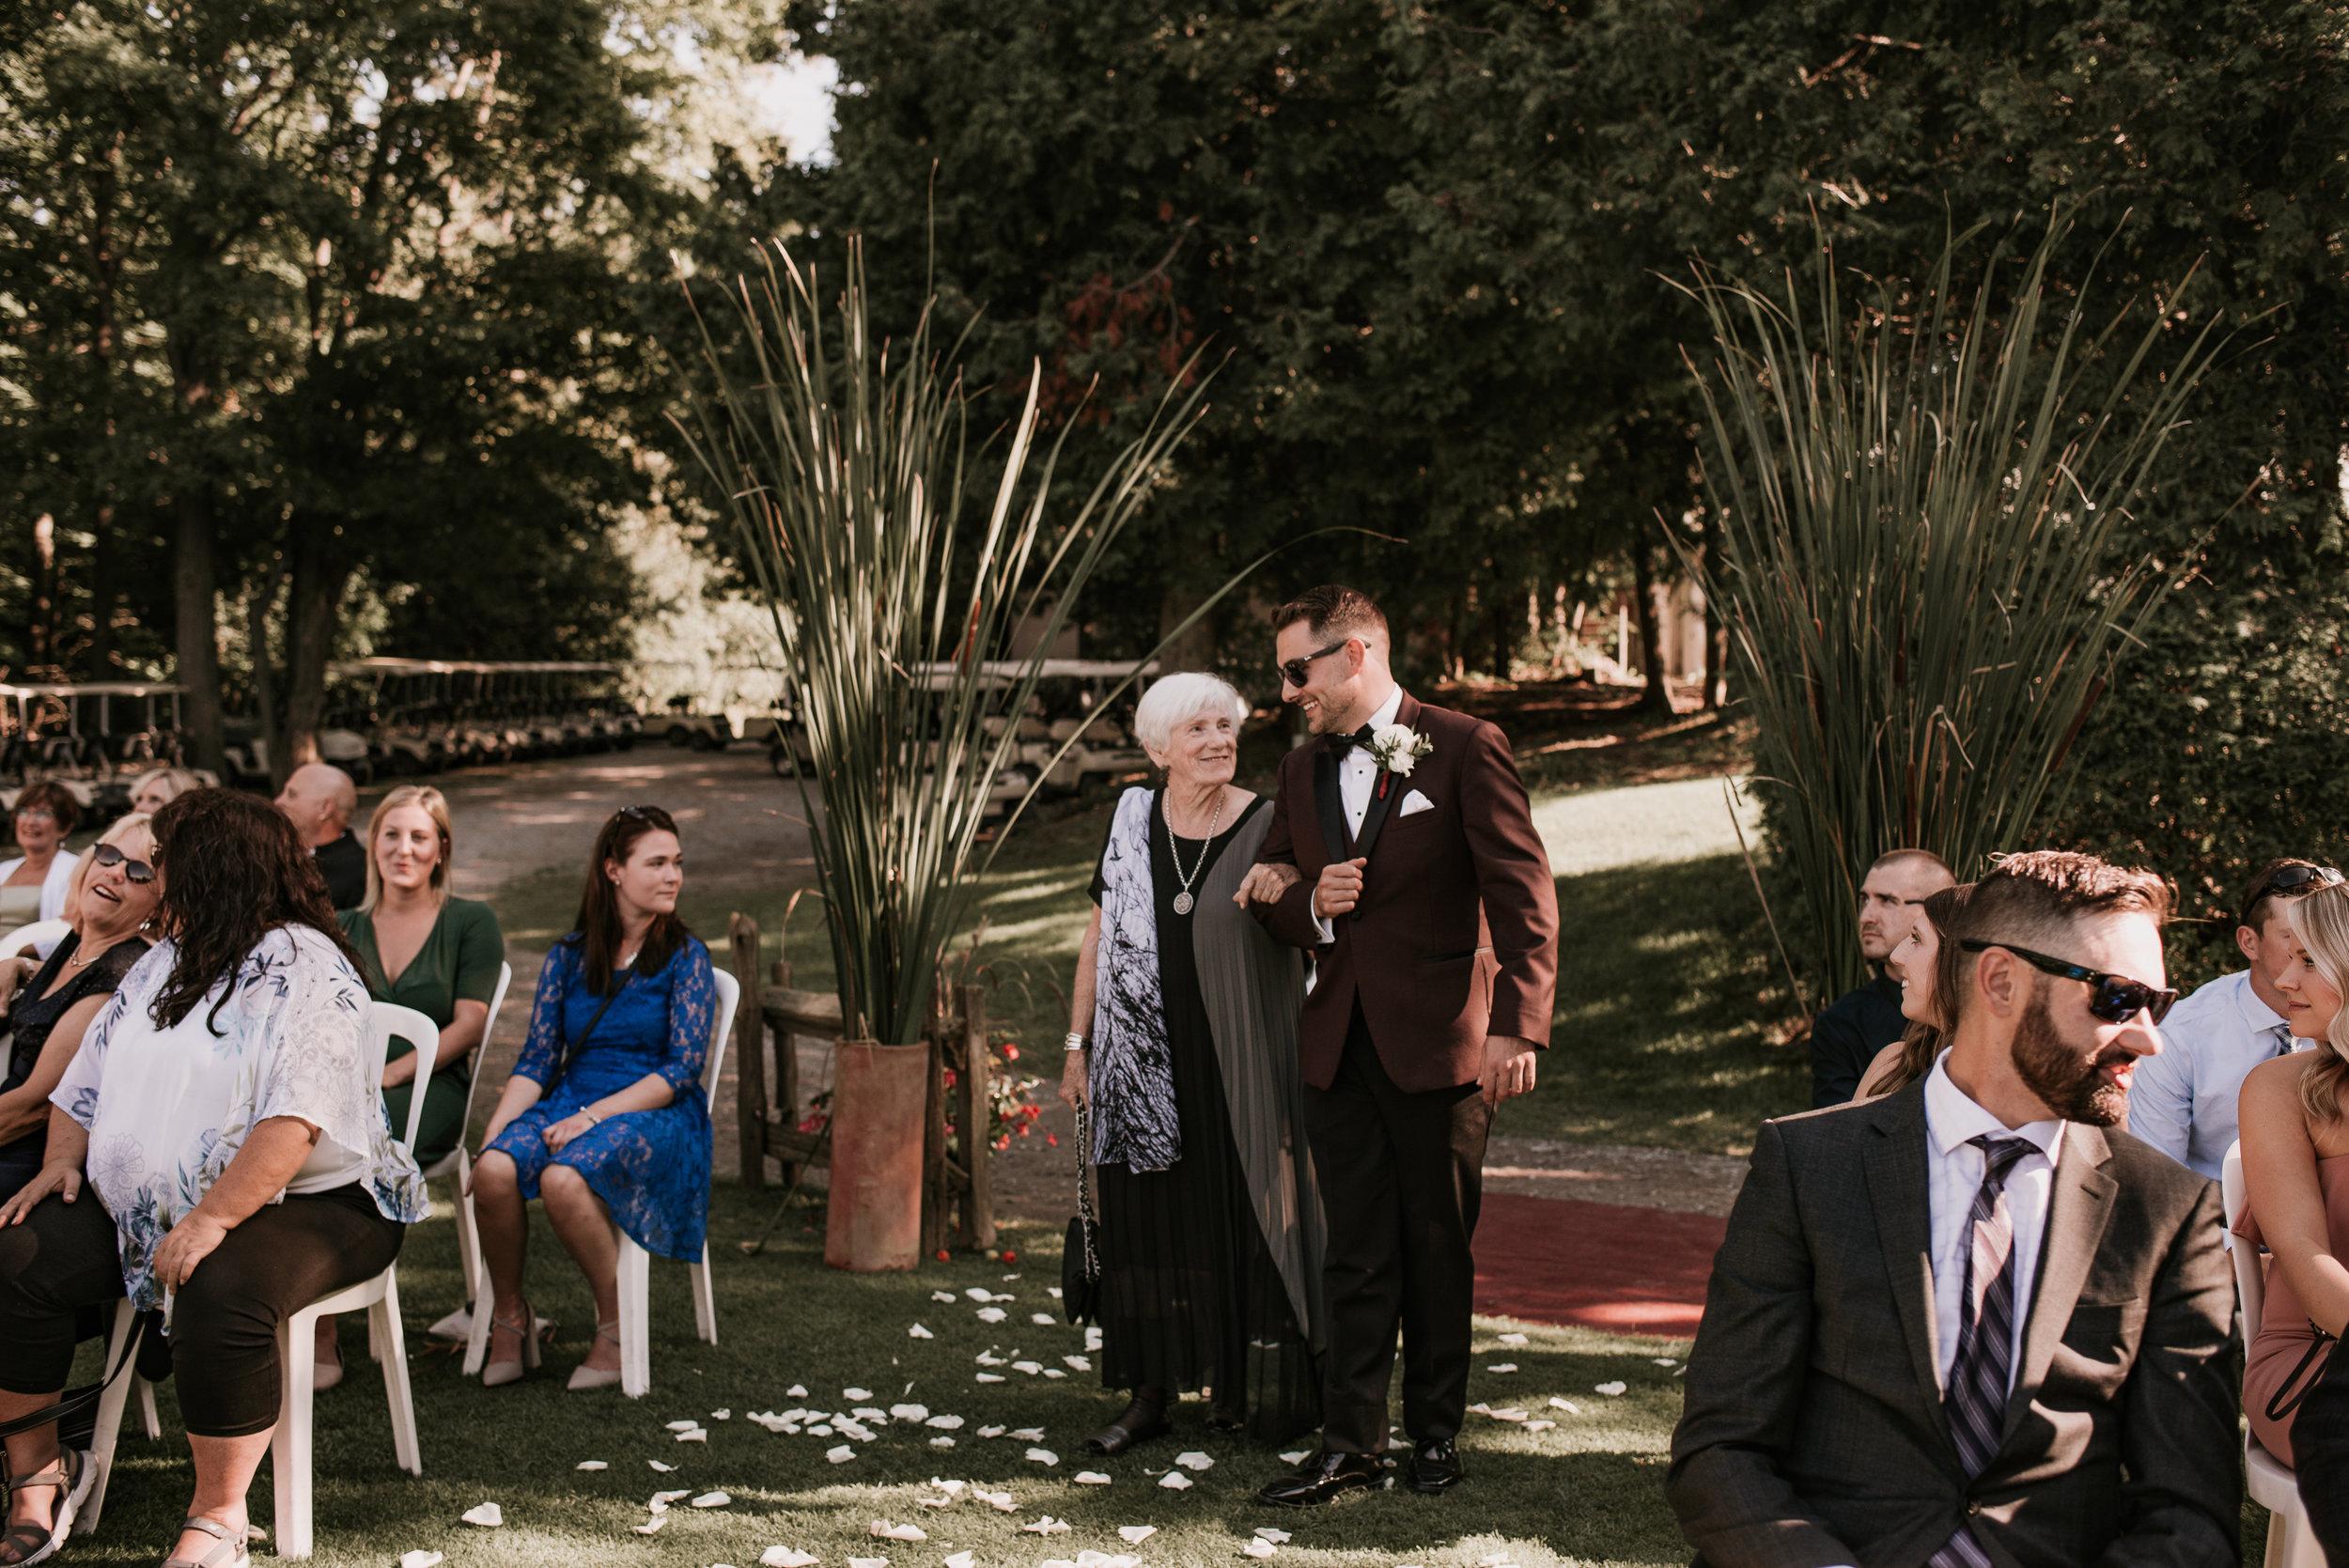 Claremont_fourseasons_Wedding-104.jpg